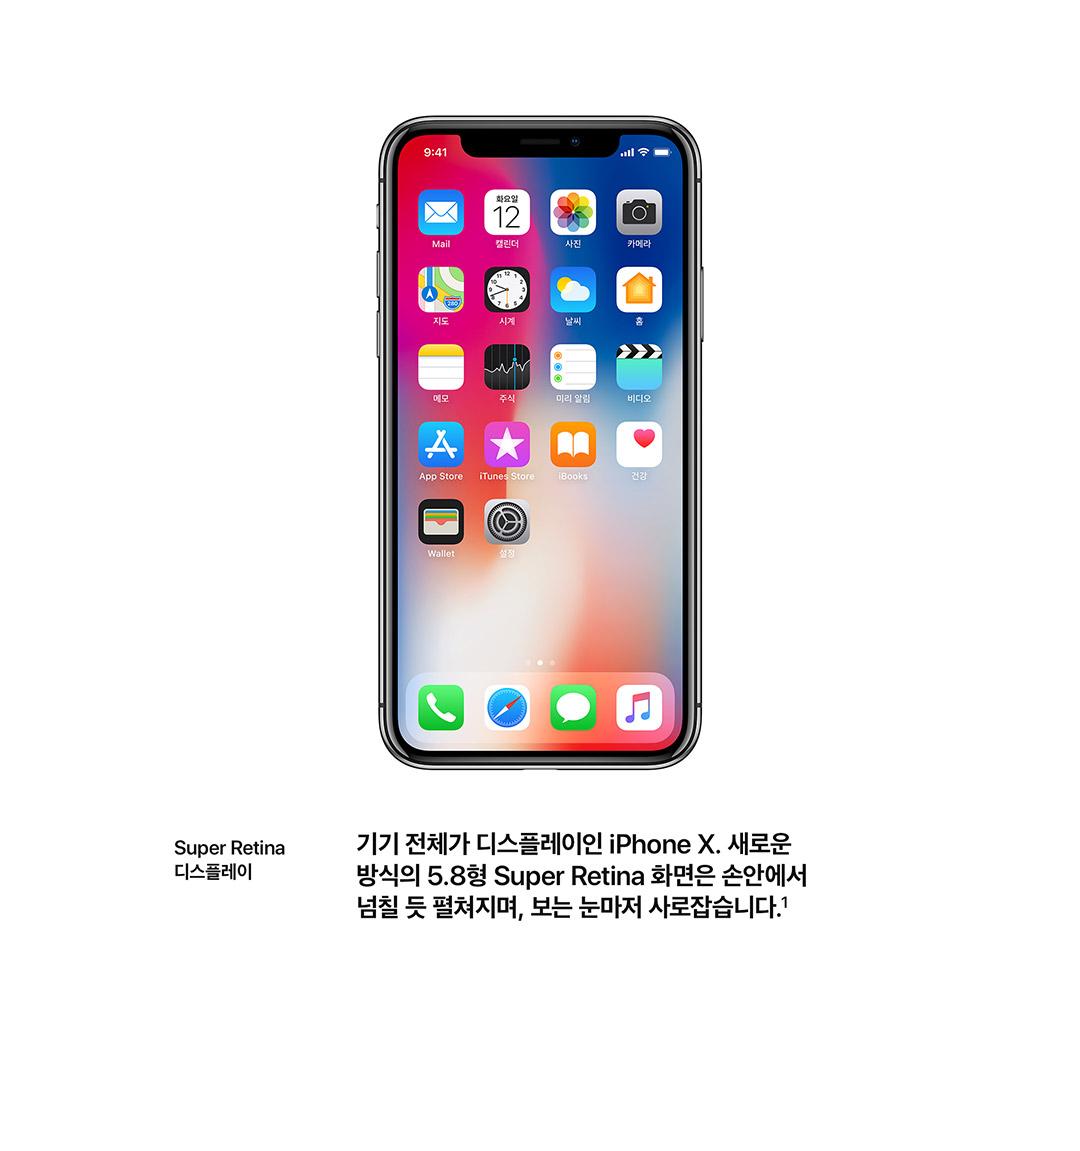 Super Rerina 디스플레이 - 기기 전체가 디스플레이인 iPhone X. 새로운 방식의 5.8형 Super Retina 화면은 손안에서 넘칠 듯 펼쳐지며, 보는 눈마저 사로잡습니다.¹